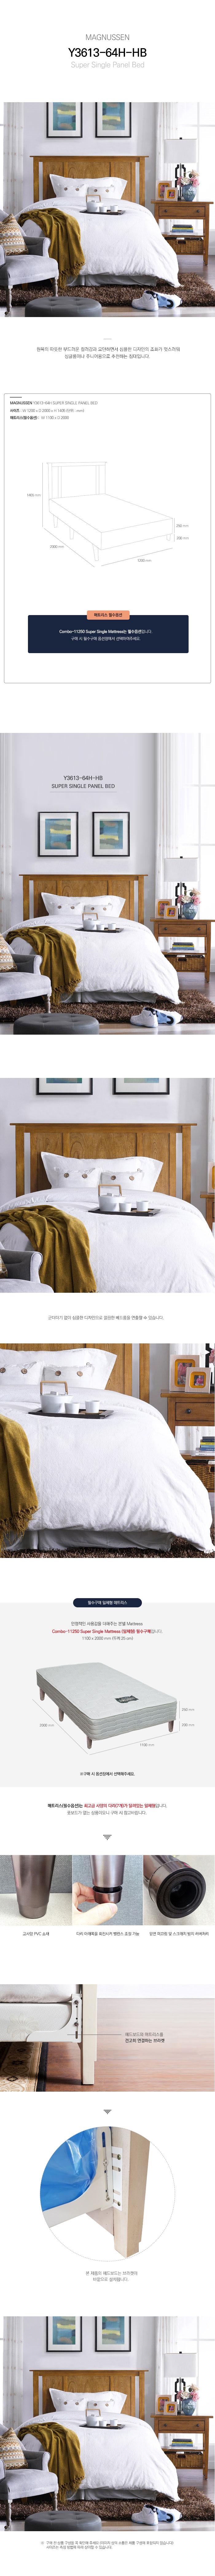 1_2_MC_Single_Bed.jpg